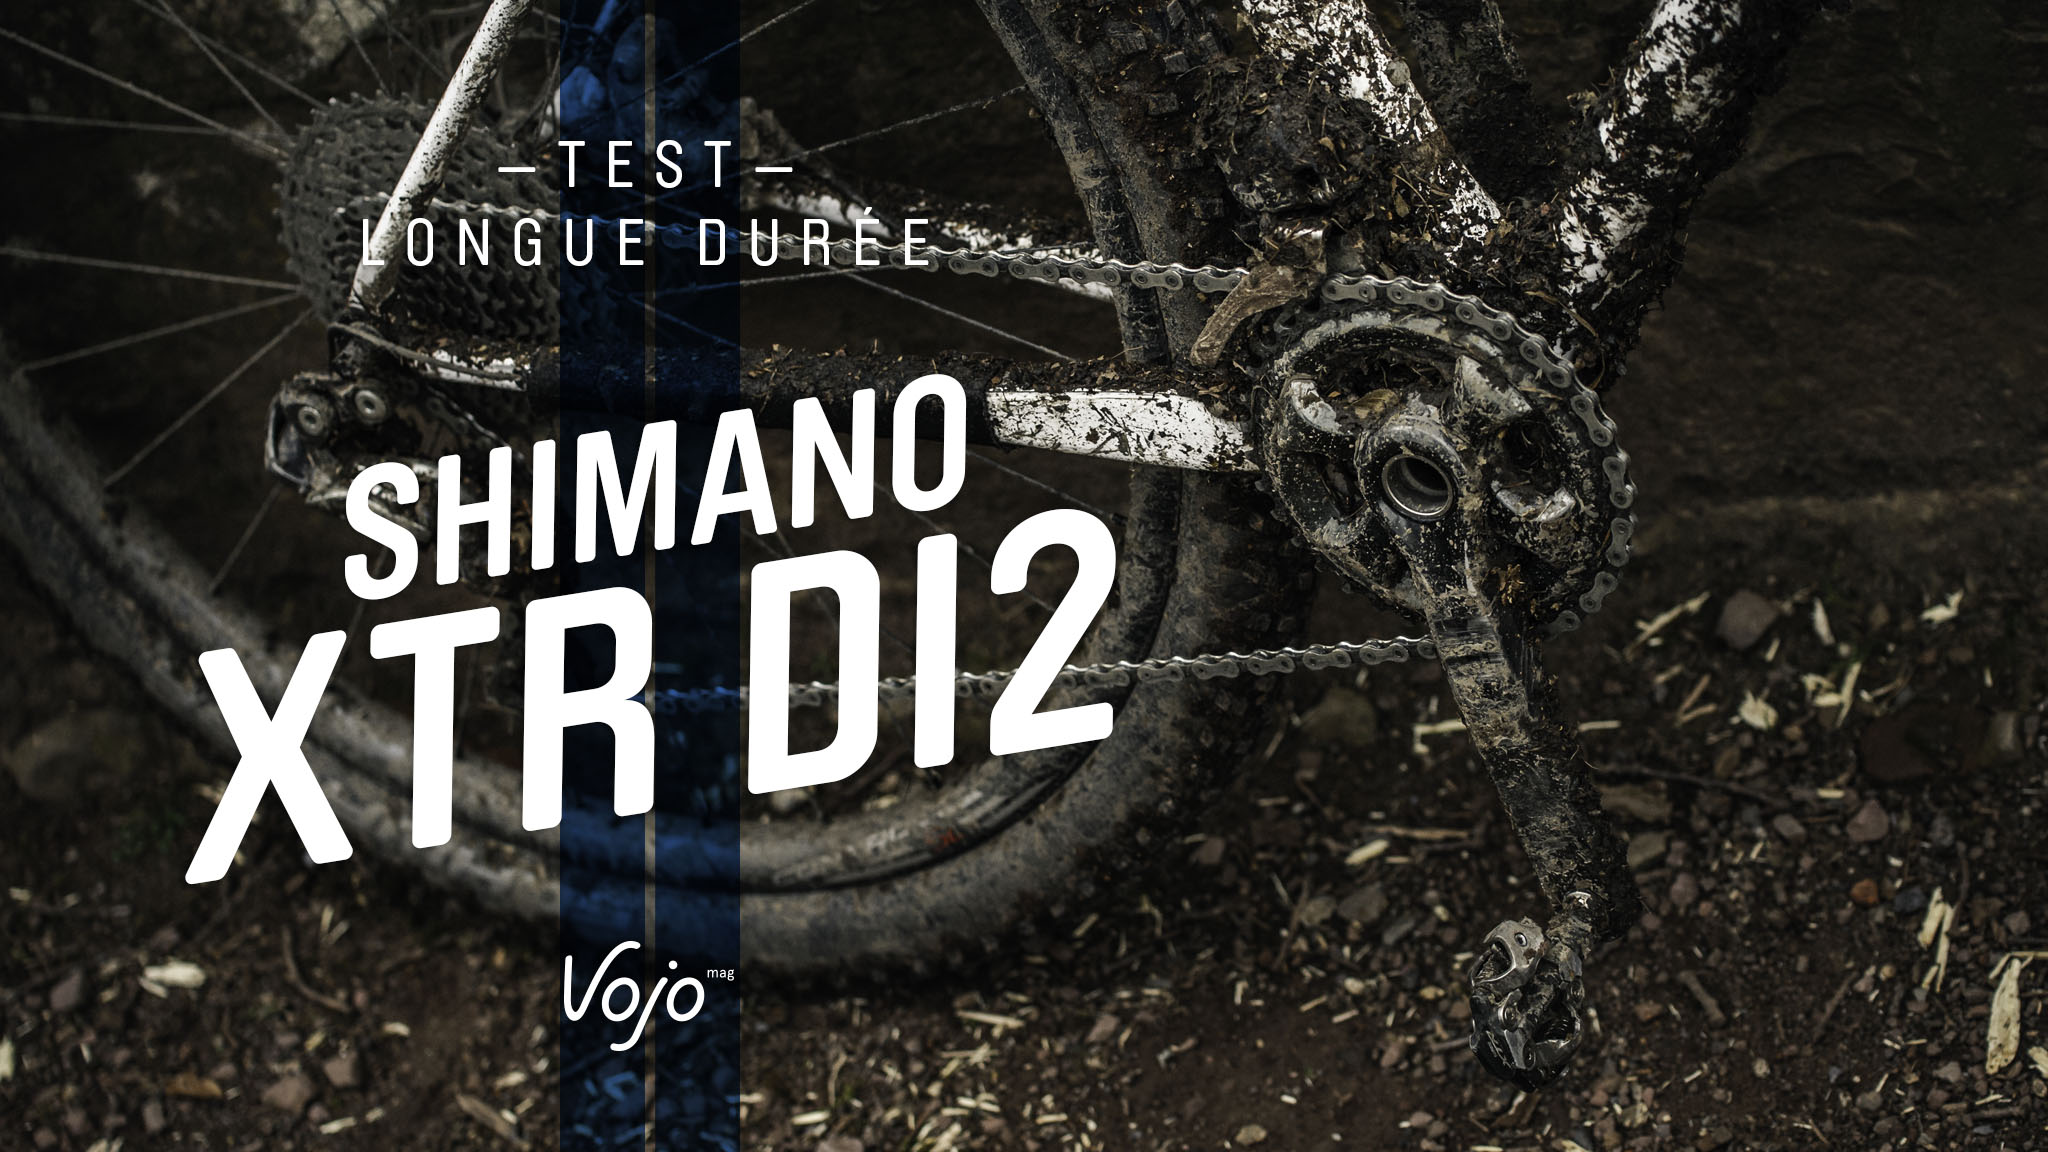 Shimano_XTR_Di2_Test_Annonce2_Copyright_OBeart_VojoMag-1